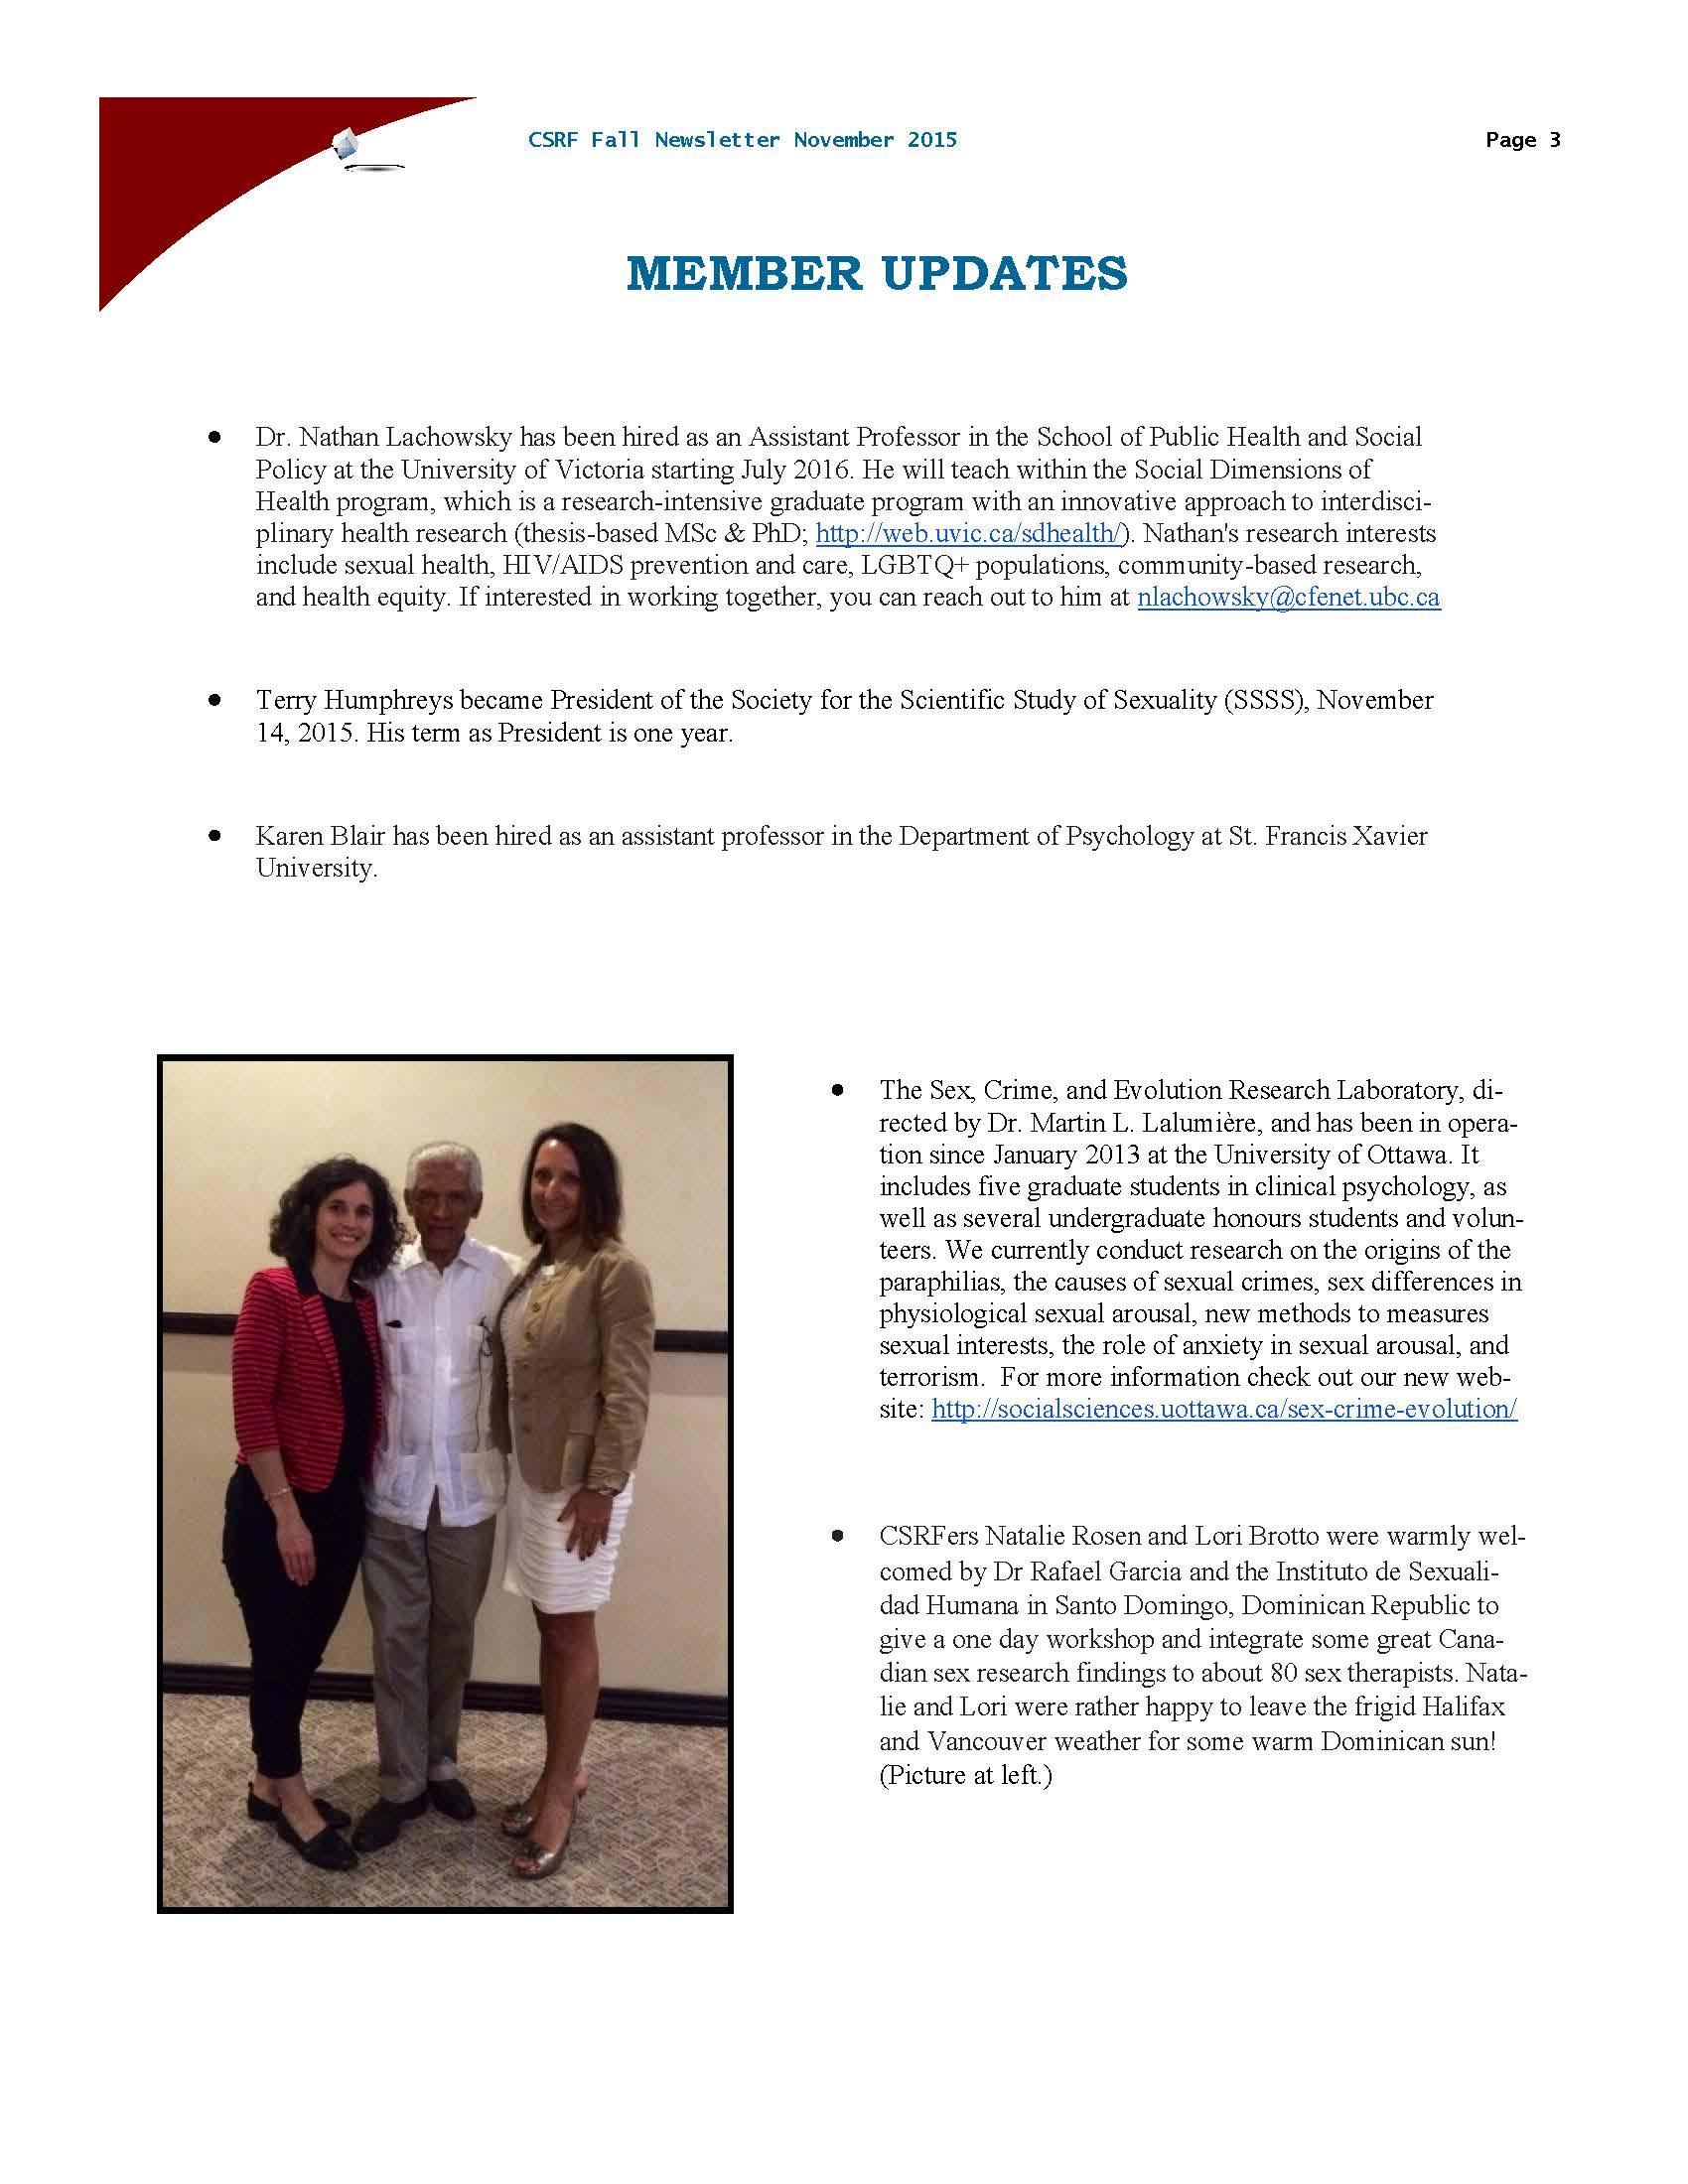 CSRF Fall Newsletter 2015_Page_03.jpg